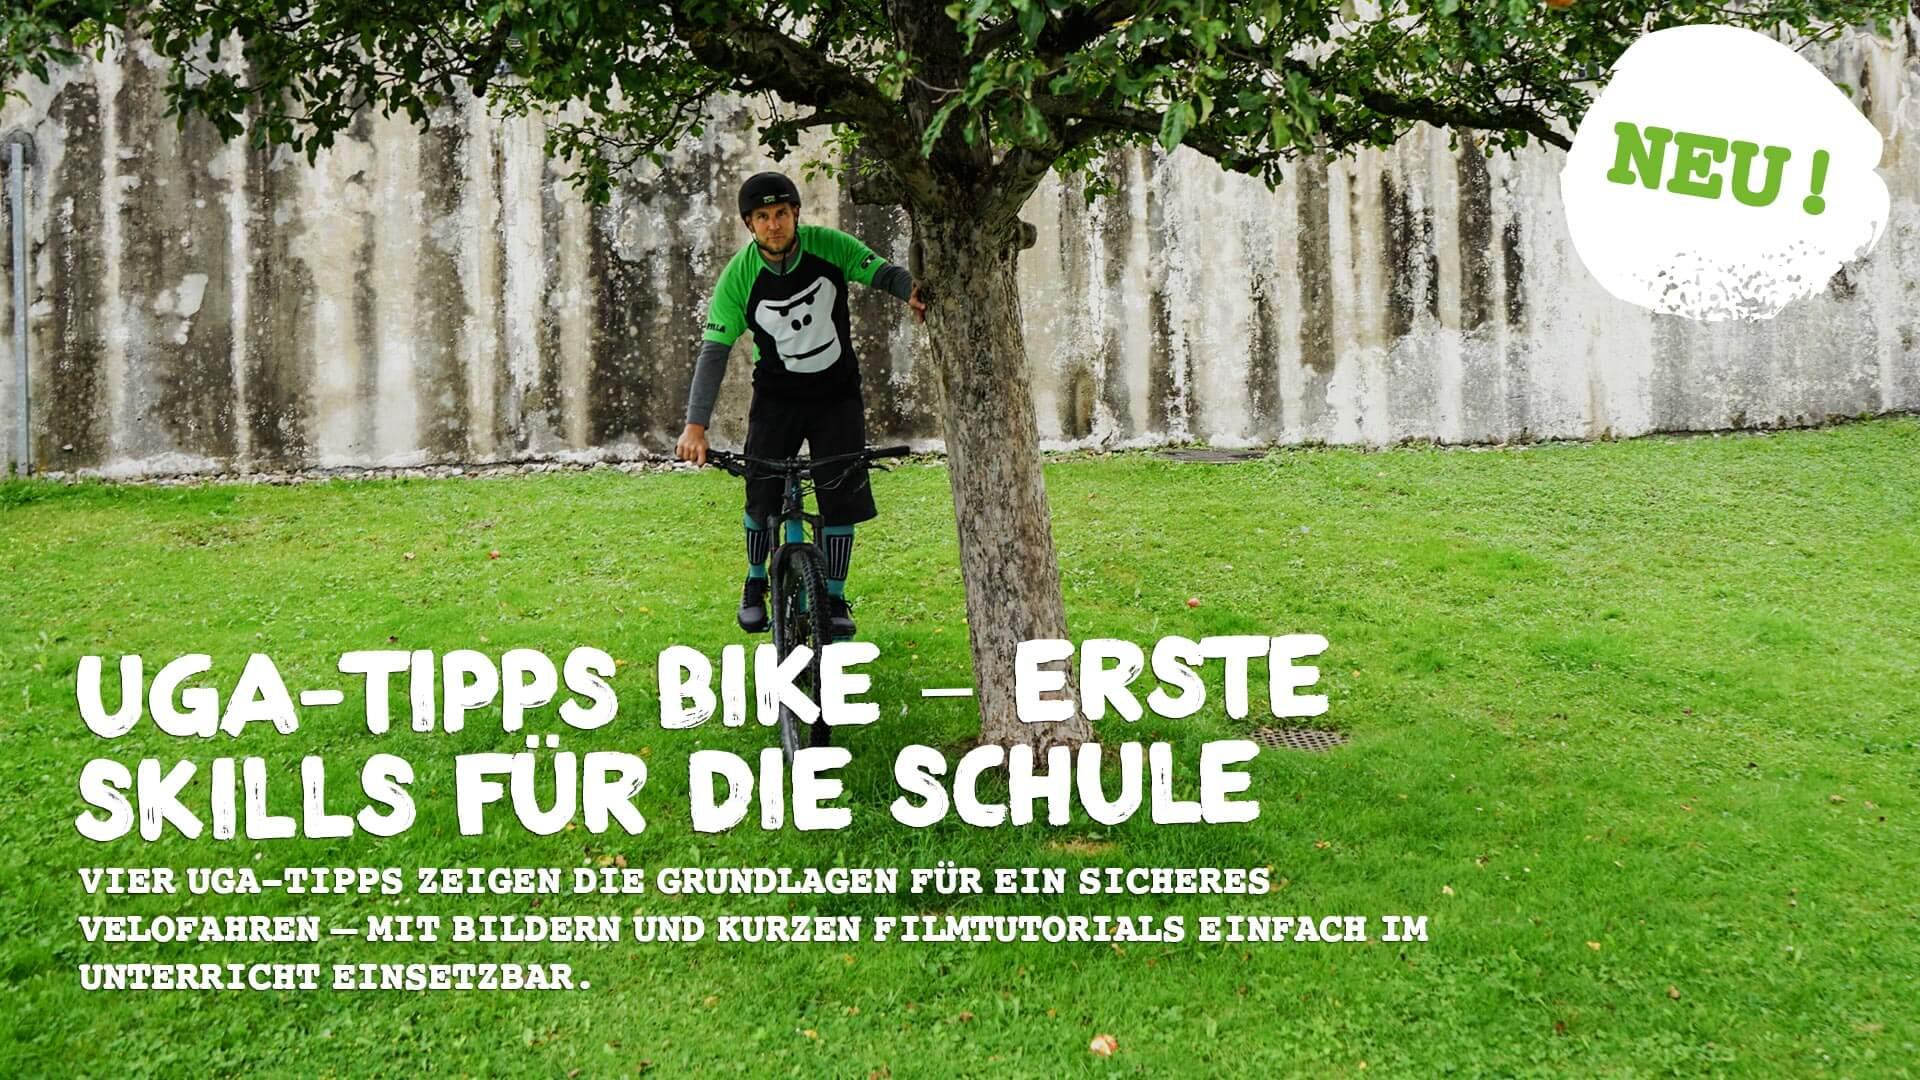 UGA-Tipps Bike – Erste Skills fuer die Schule